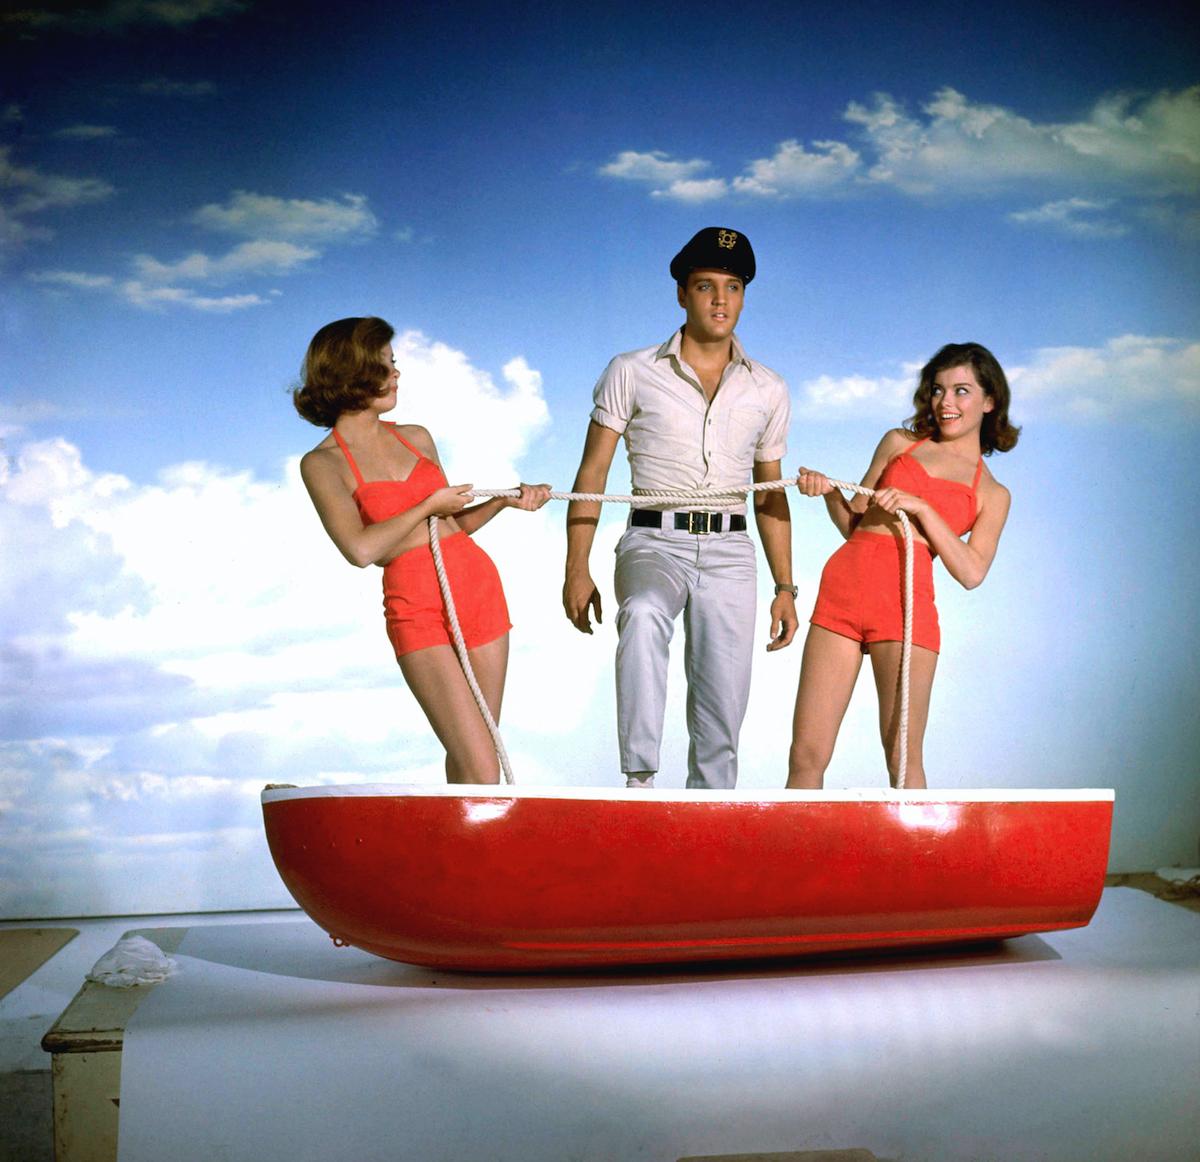 Elvis promoting the movie 'Girls! Girls! Girls!'